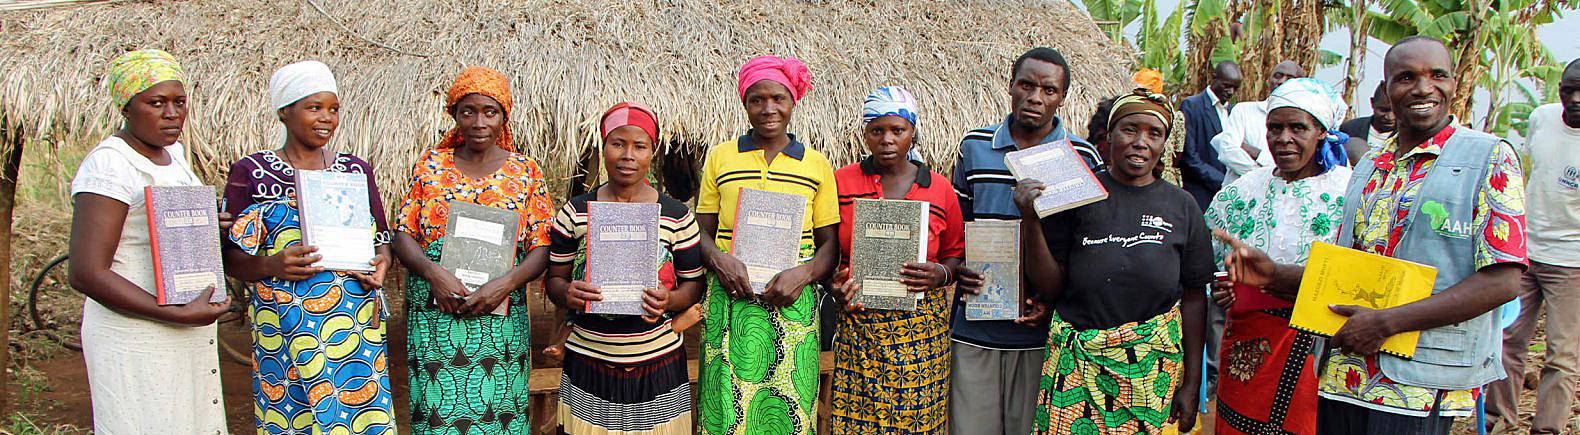 Peopleweaver Tuunagane Women's Adult School, Kyangwali Refugee Settlement, Uganda